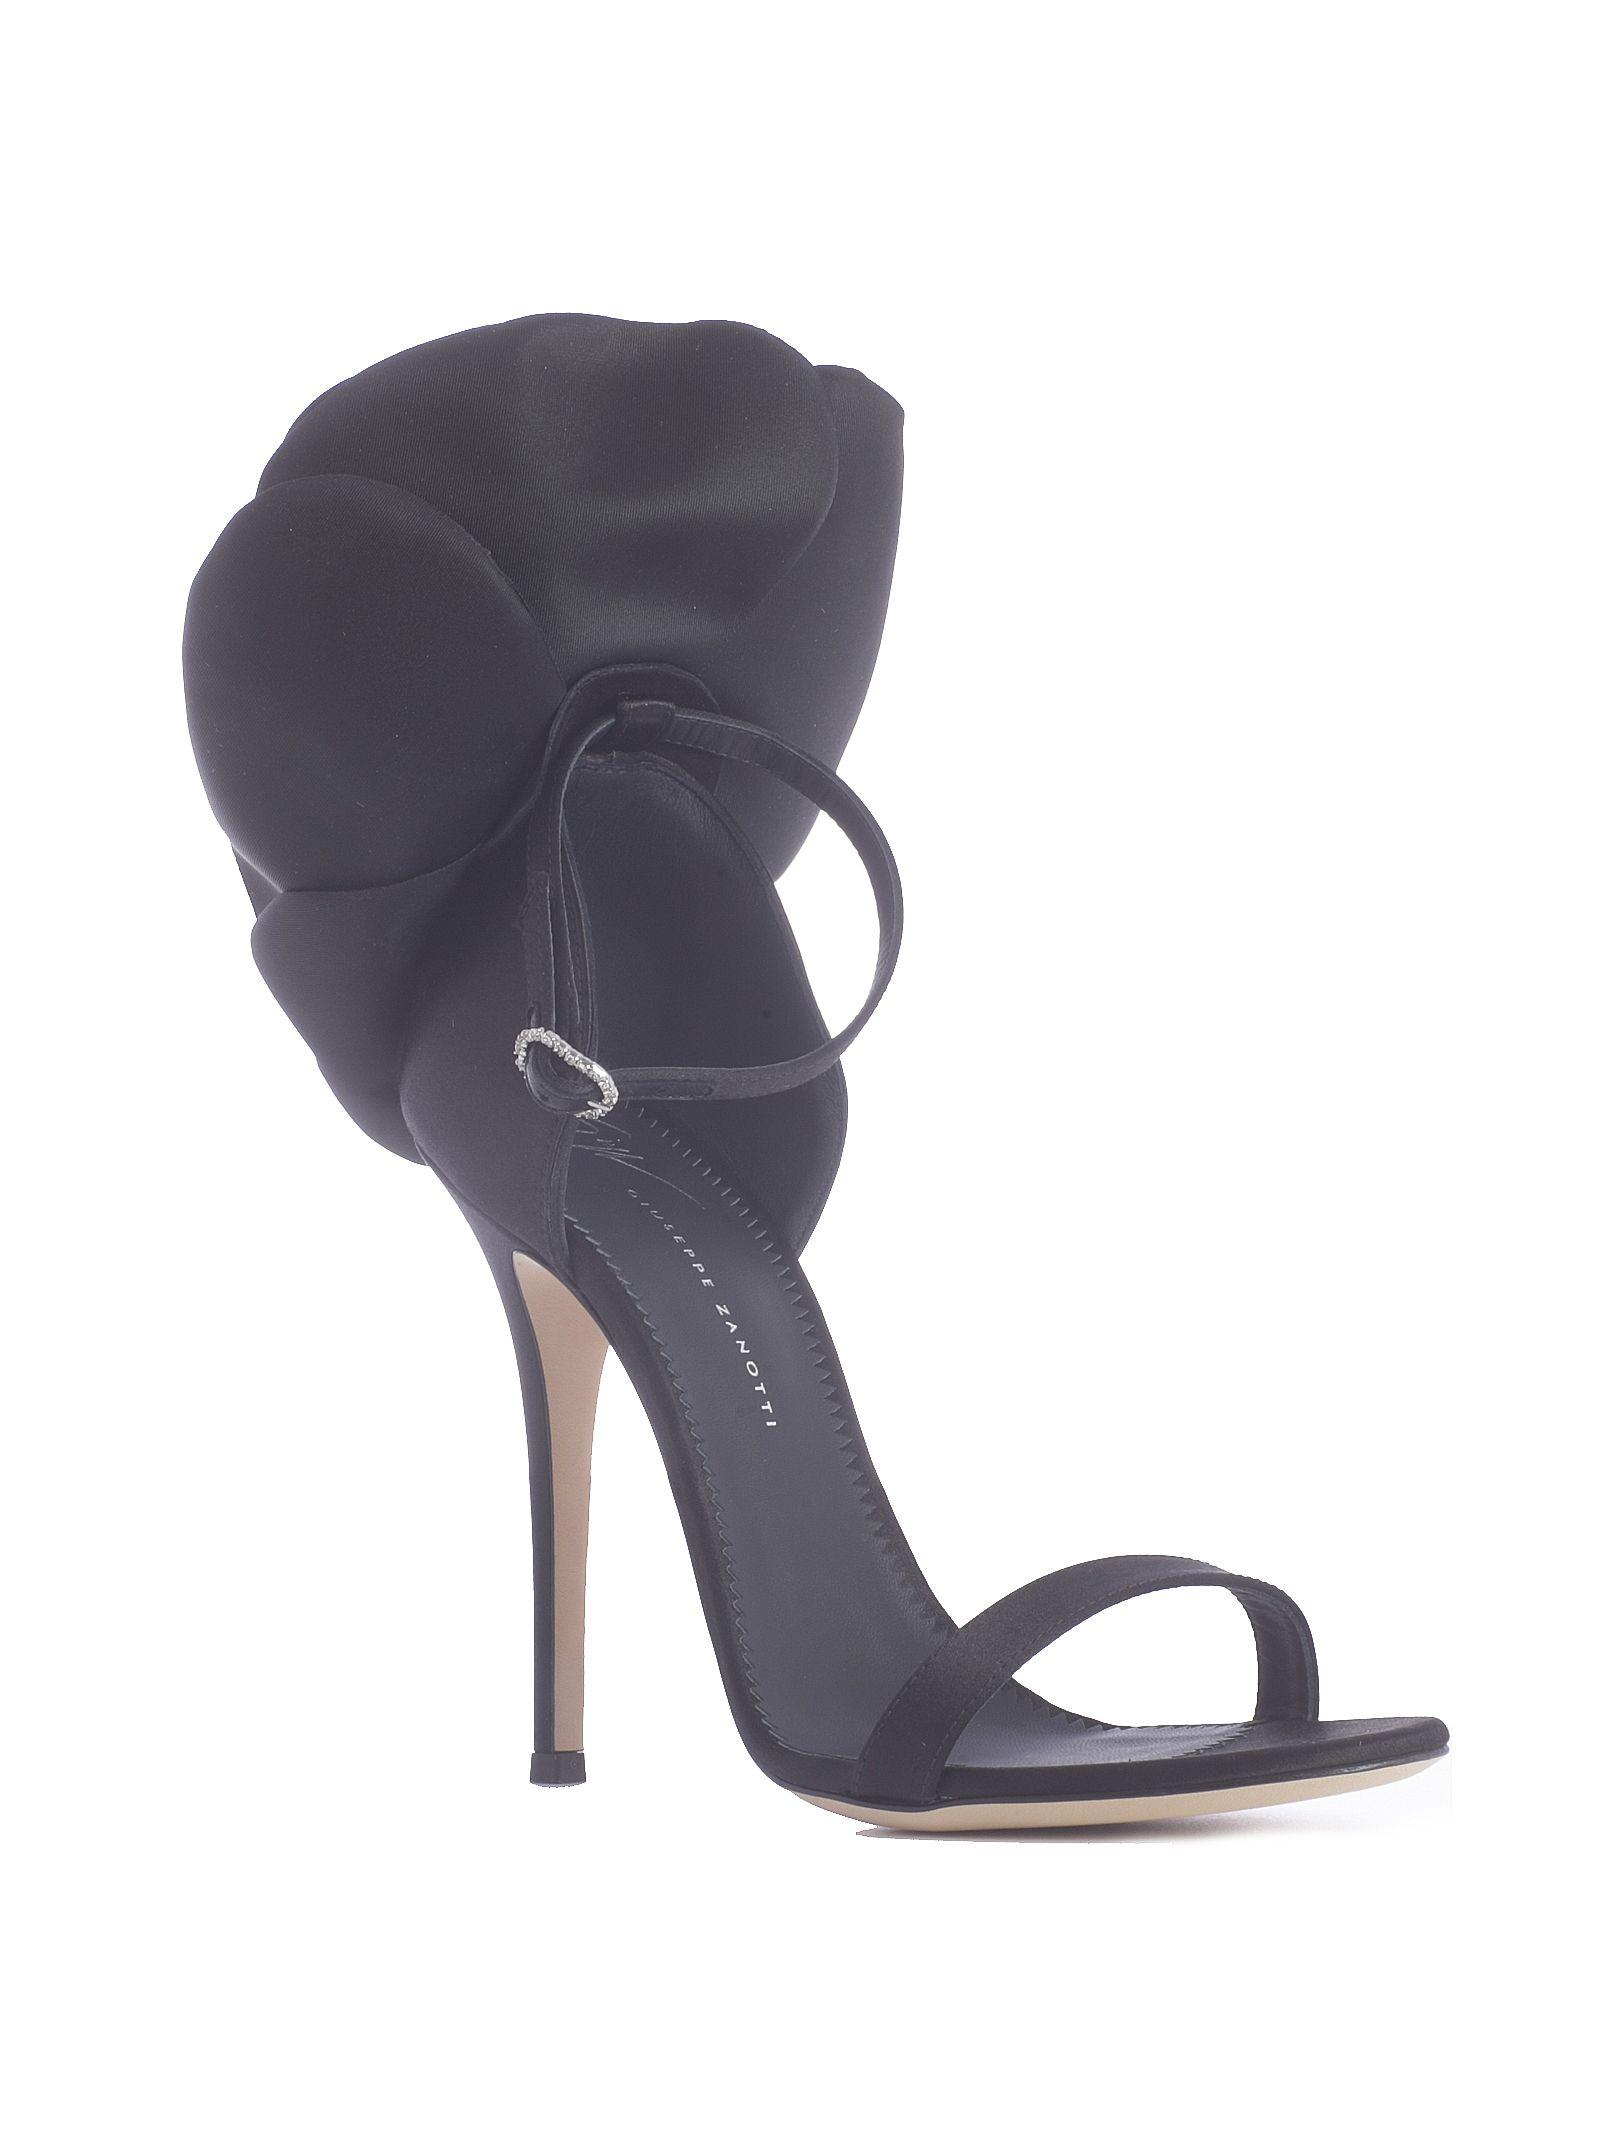 447f795a2be07 Giuseppe Zanotti Giuseppe Zanotti Design Embellished Ankle Sandals ...